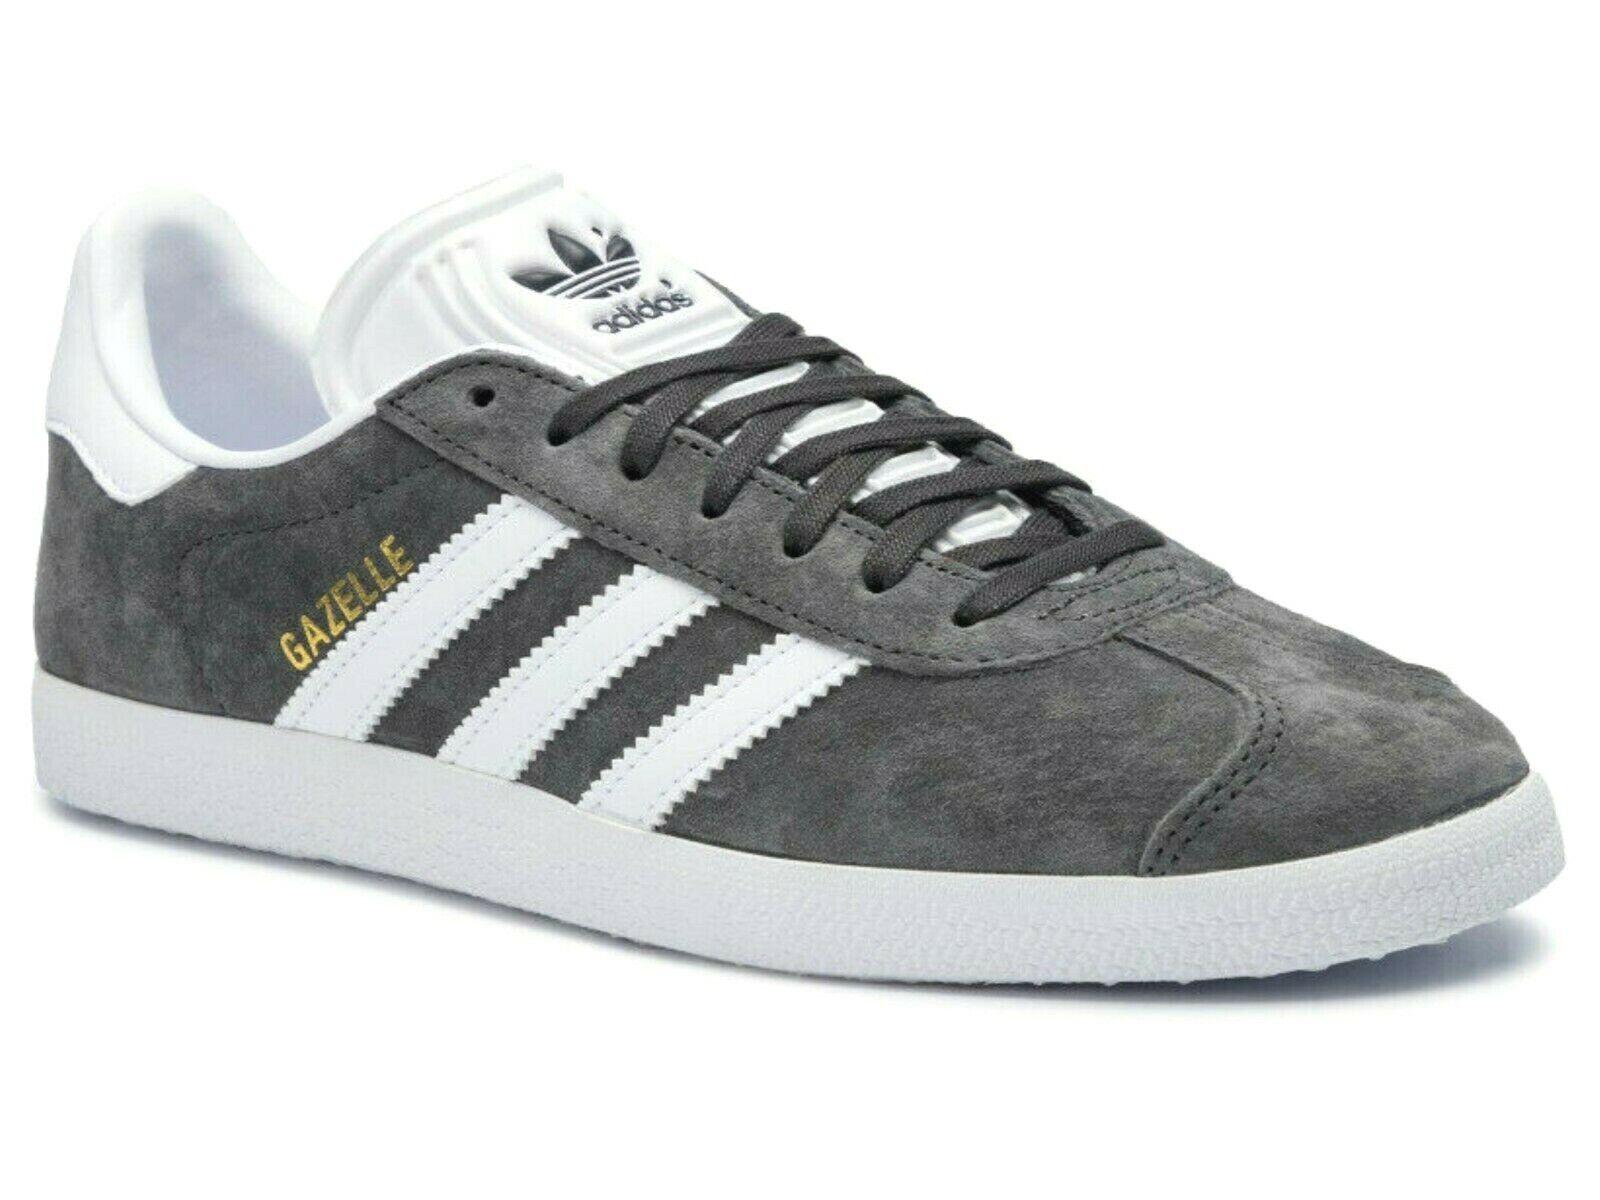 adidas SNEAKERS Gazelle BB5480 Dark